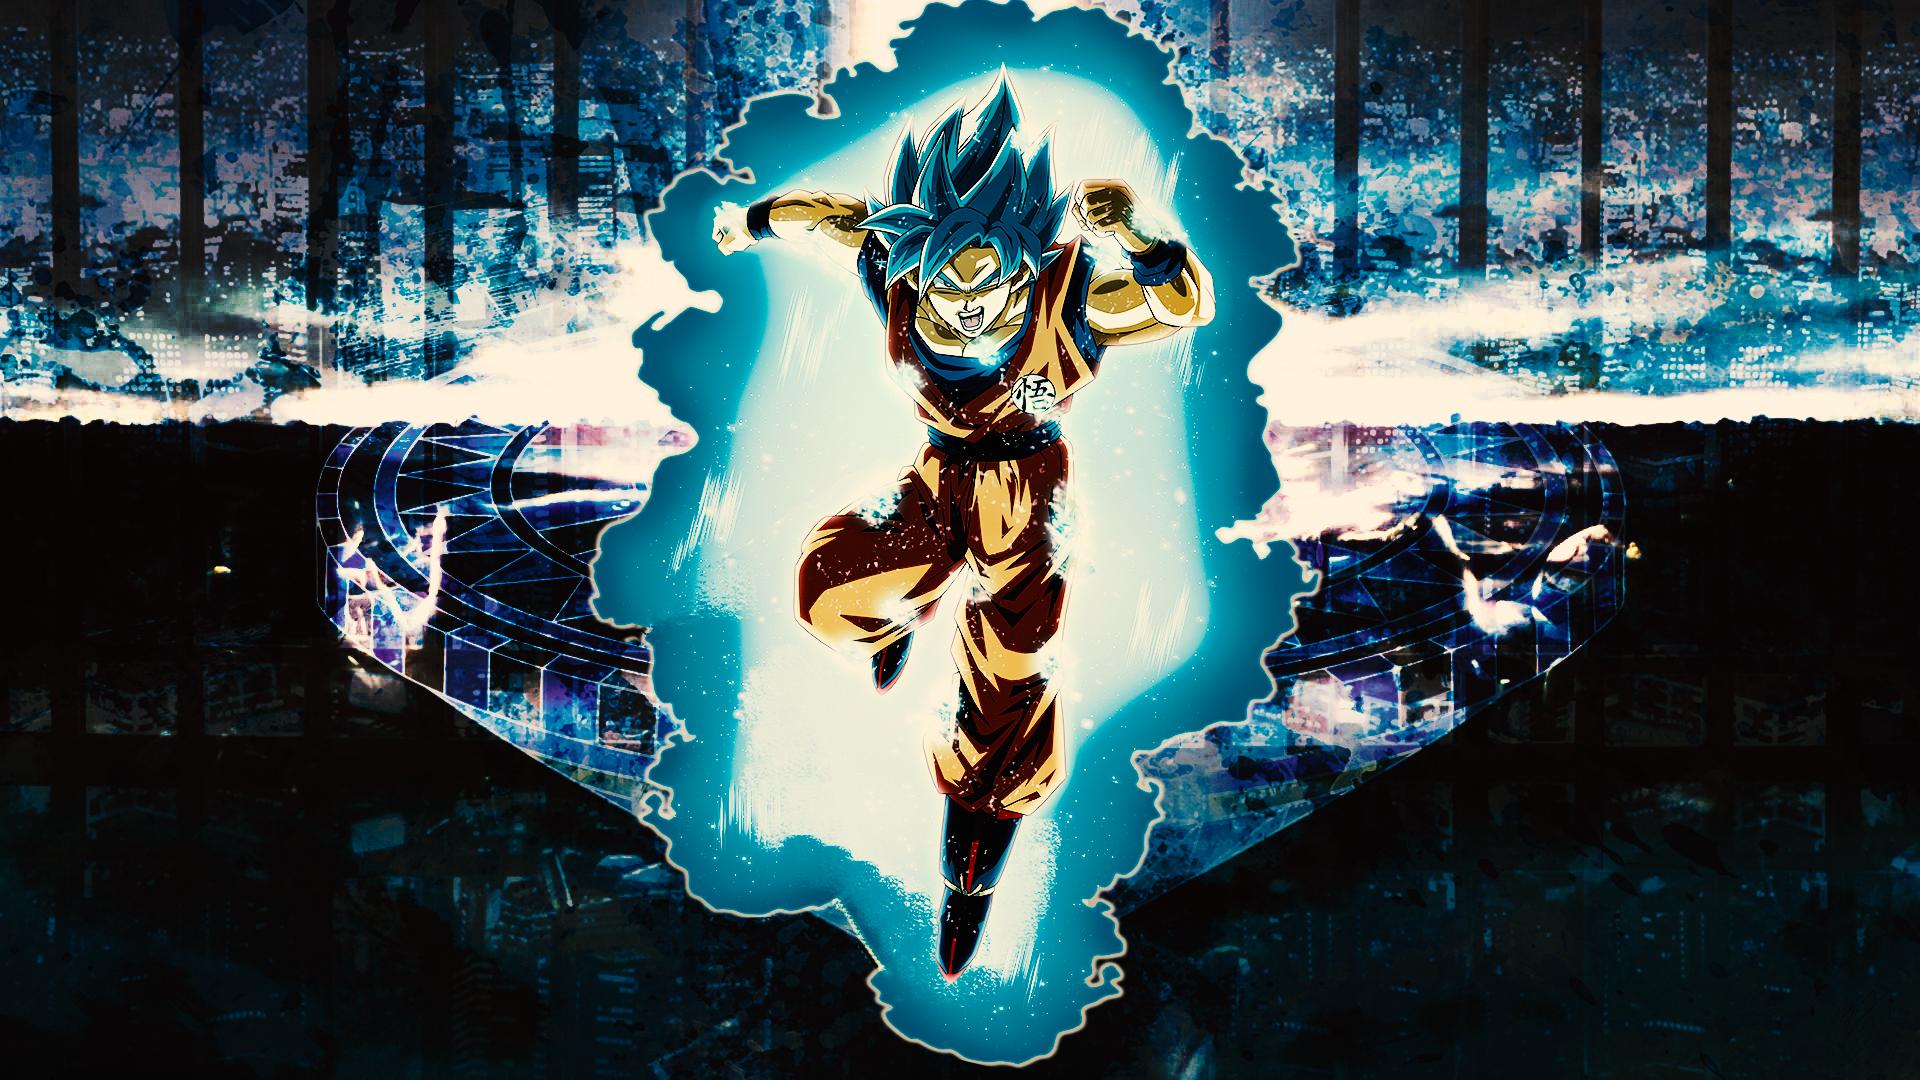 Wallpaper Son Goku Dragon Ball Dragon Ball Z Kai Vegeta Black Goku Super Saiyan Super Saiyan Blue Super Saiyan Ros Super Saiyan 3 Dragon Ball Super 1920x1080 Kyofurex 1222884 Hd Wallpapers Wallhere